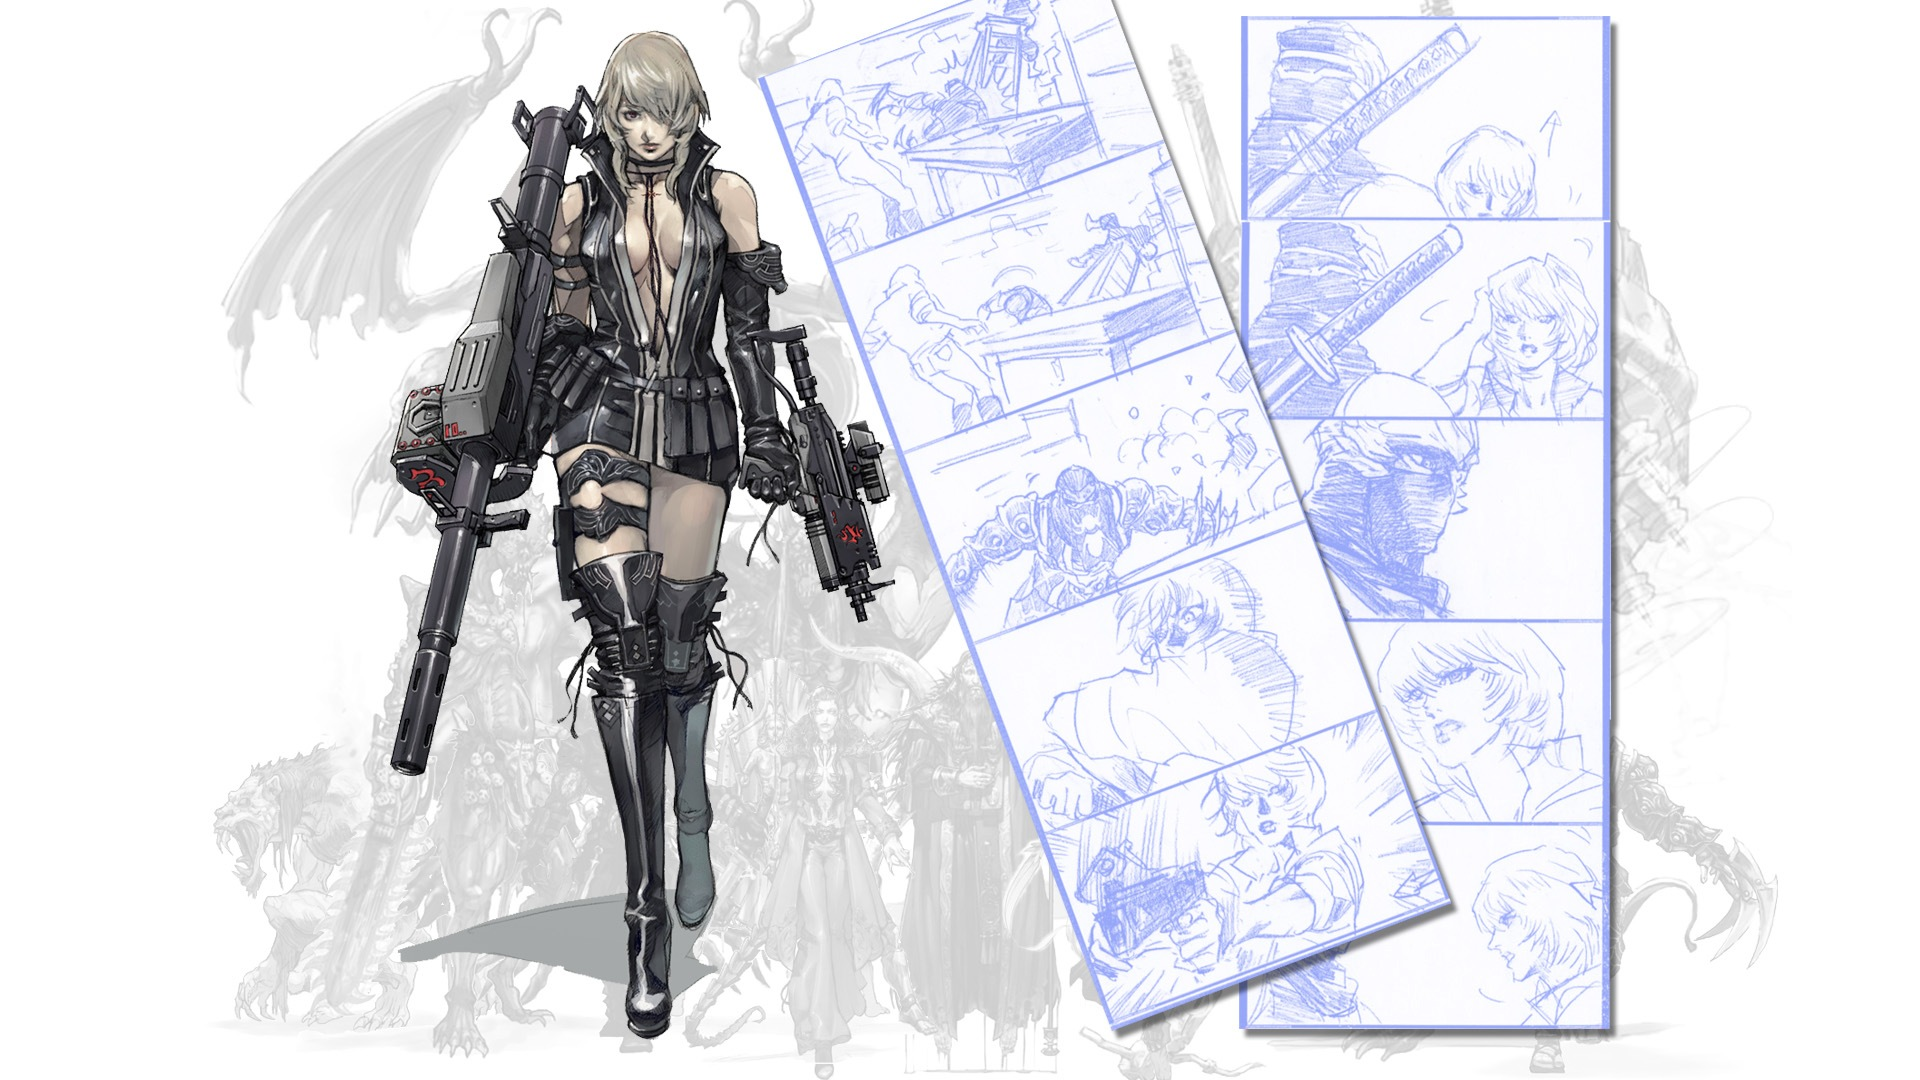 Ninja Gaiden 2 Sonia And Genshin Artwork And Renders Addicted To Ludus